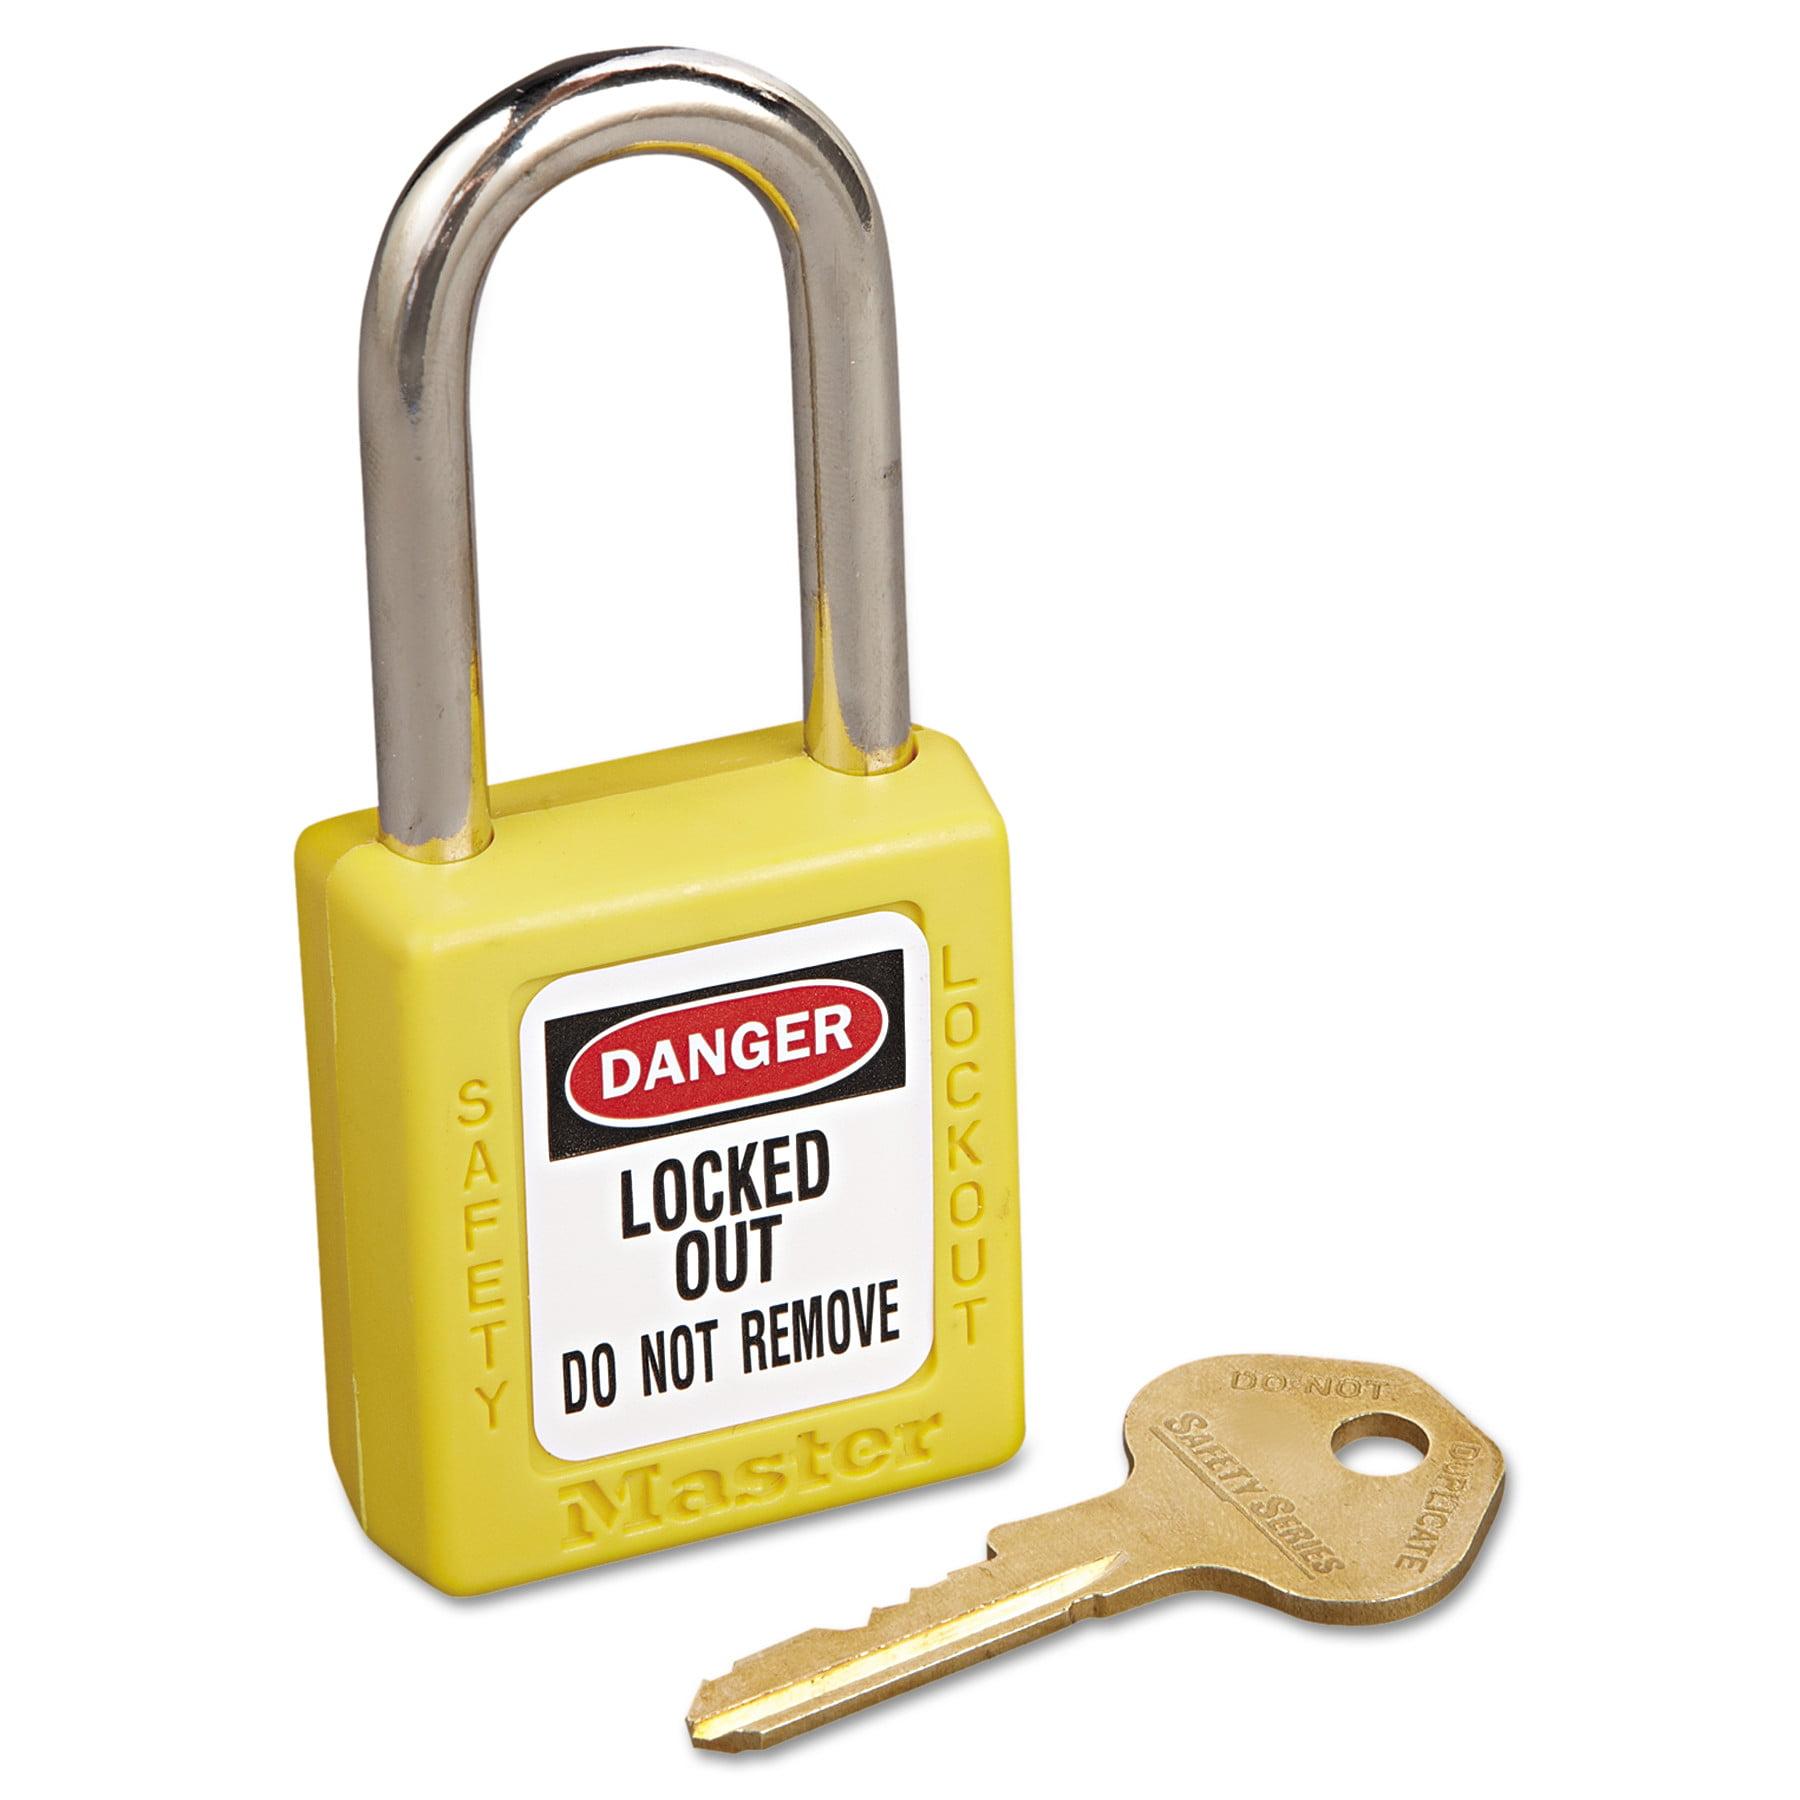 Master Lock No. 410 Lightweight Xenoy Safety Lockout Padlock, 6 Pin, Yellow